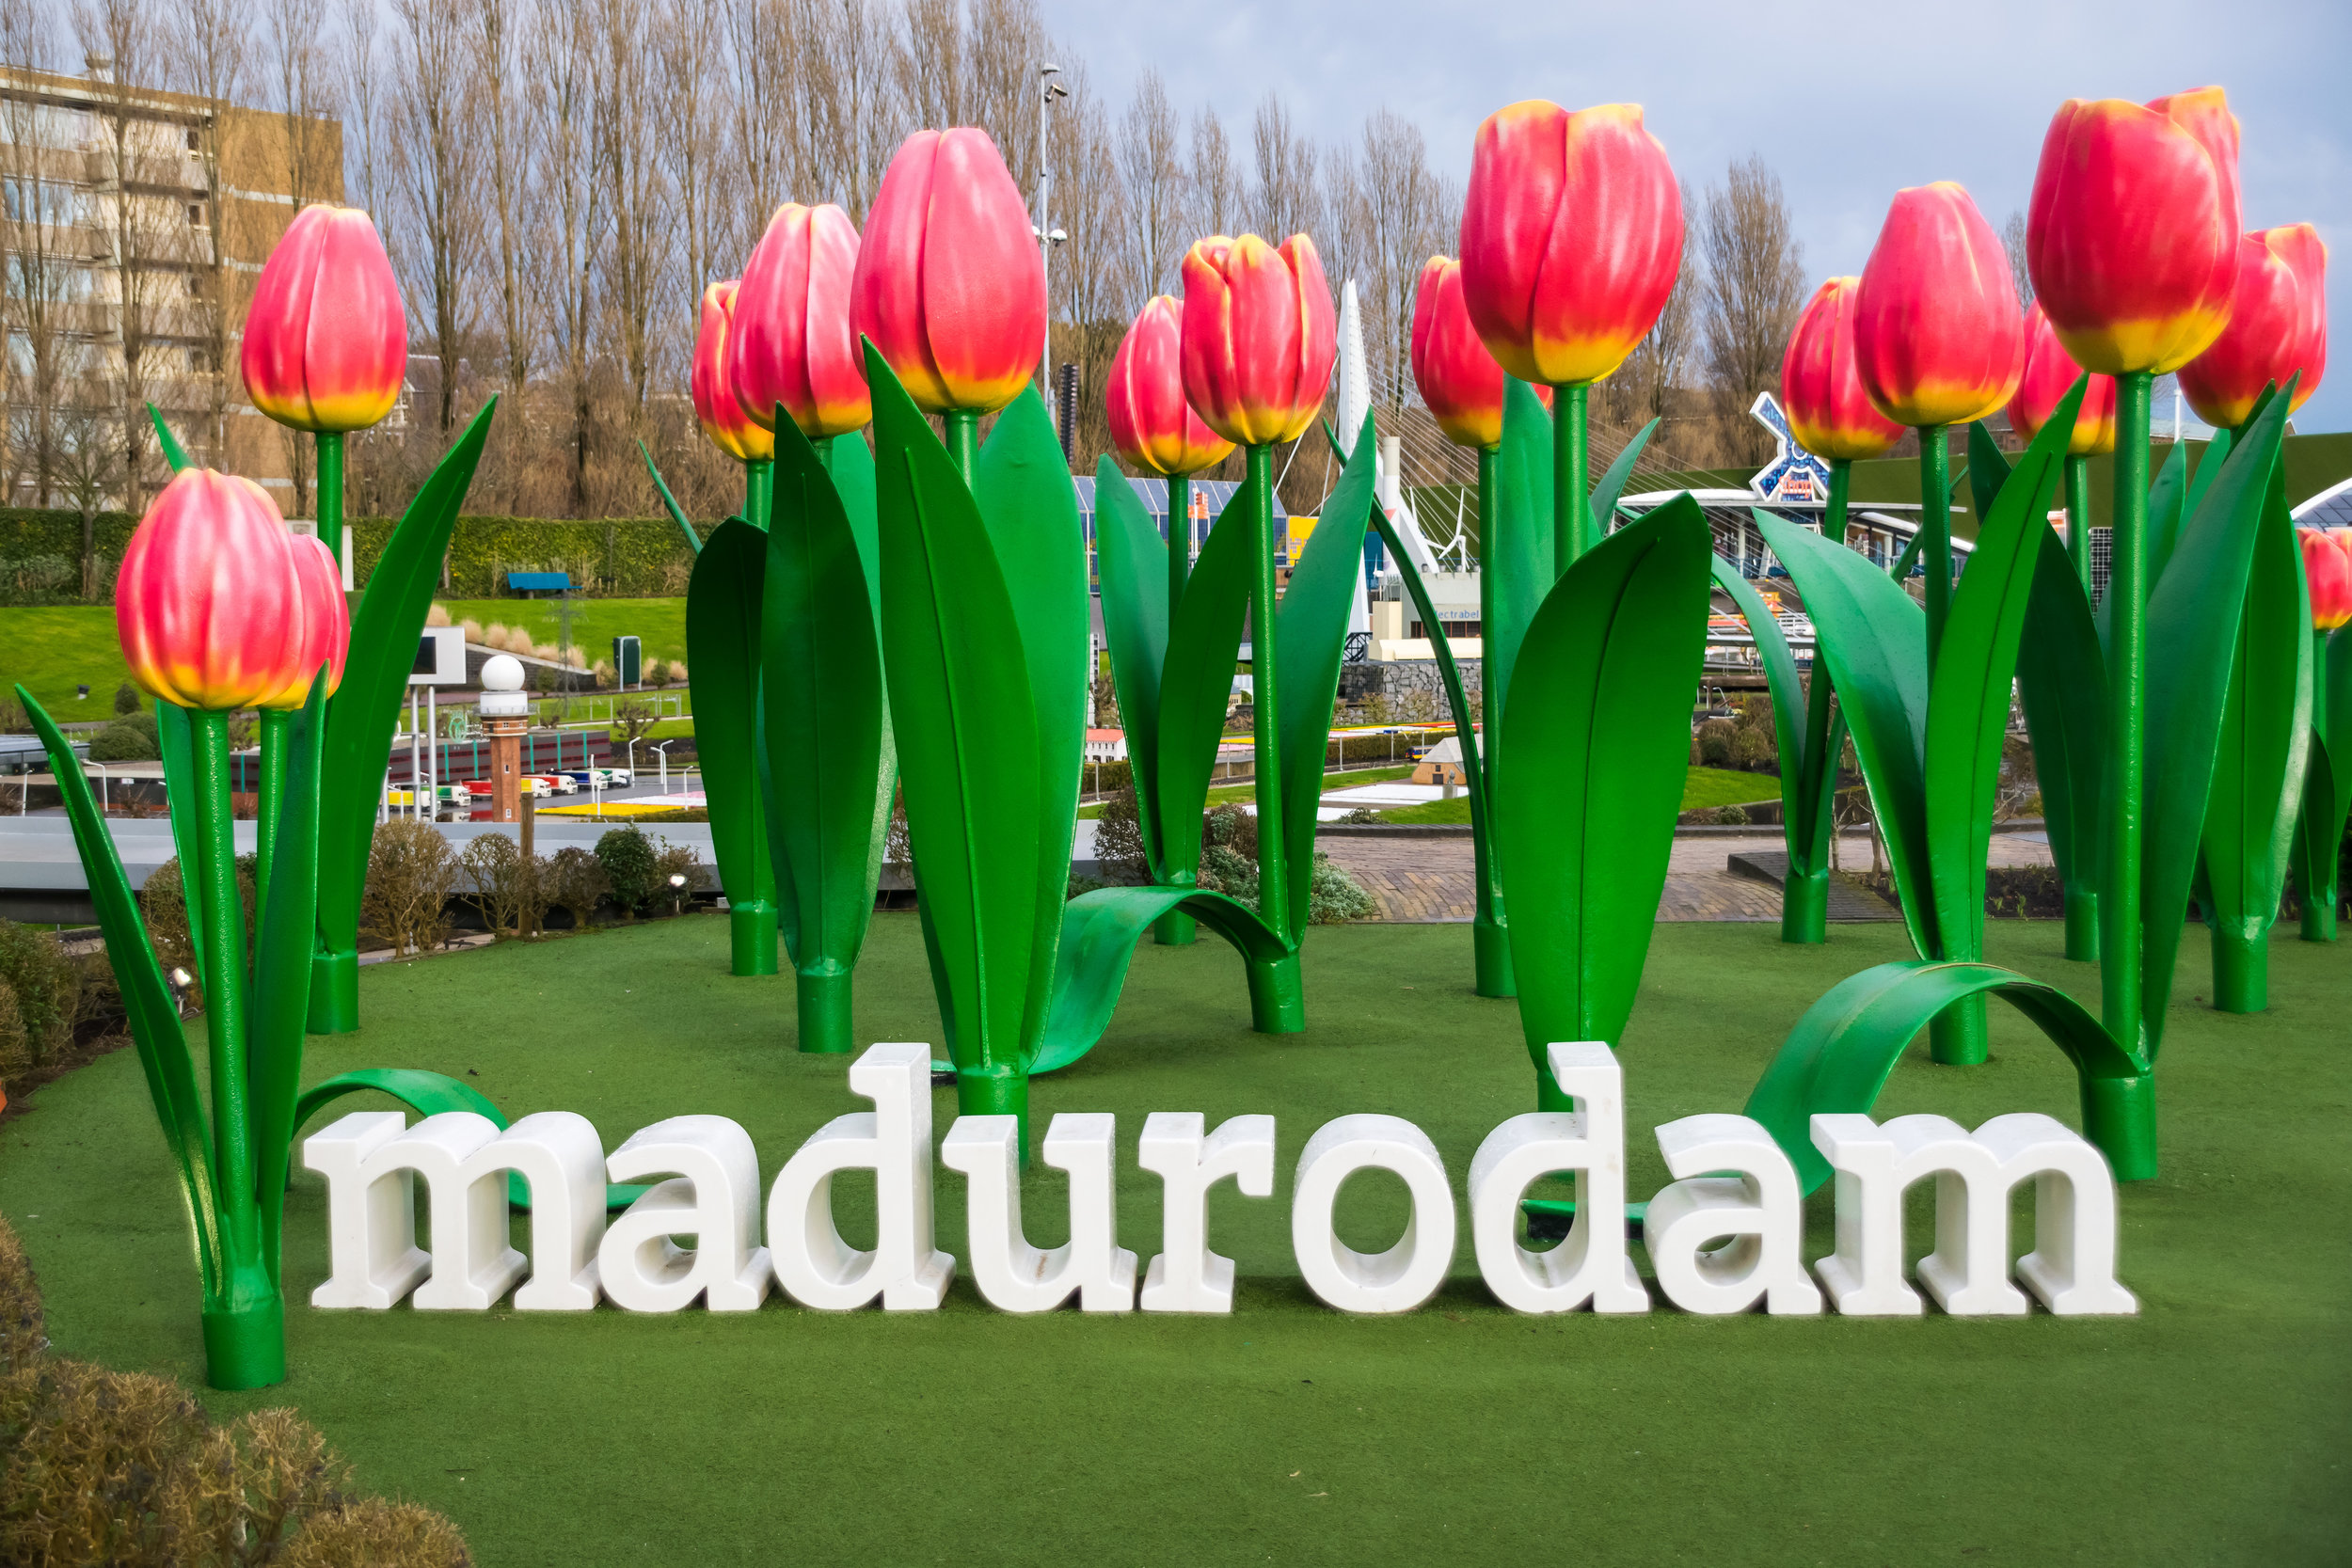 The Hague Madurodam-1.jpg